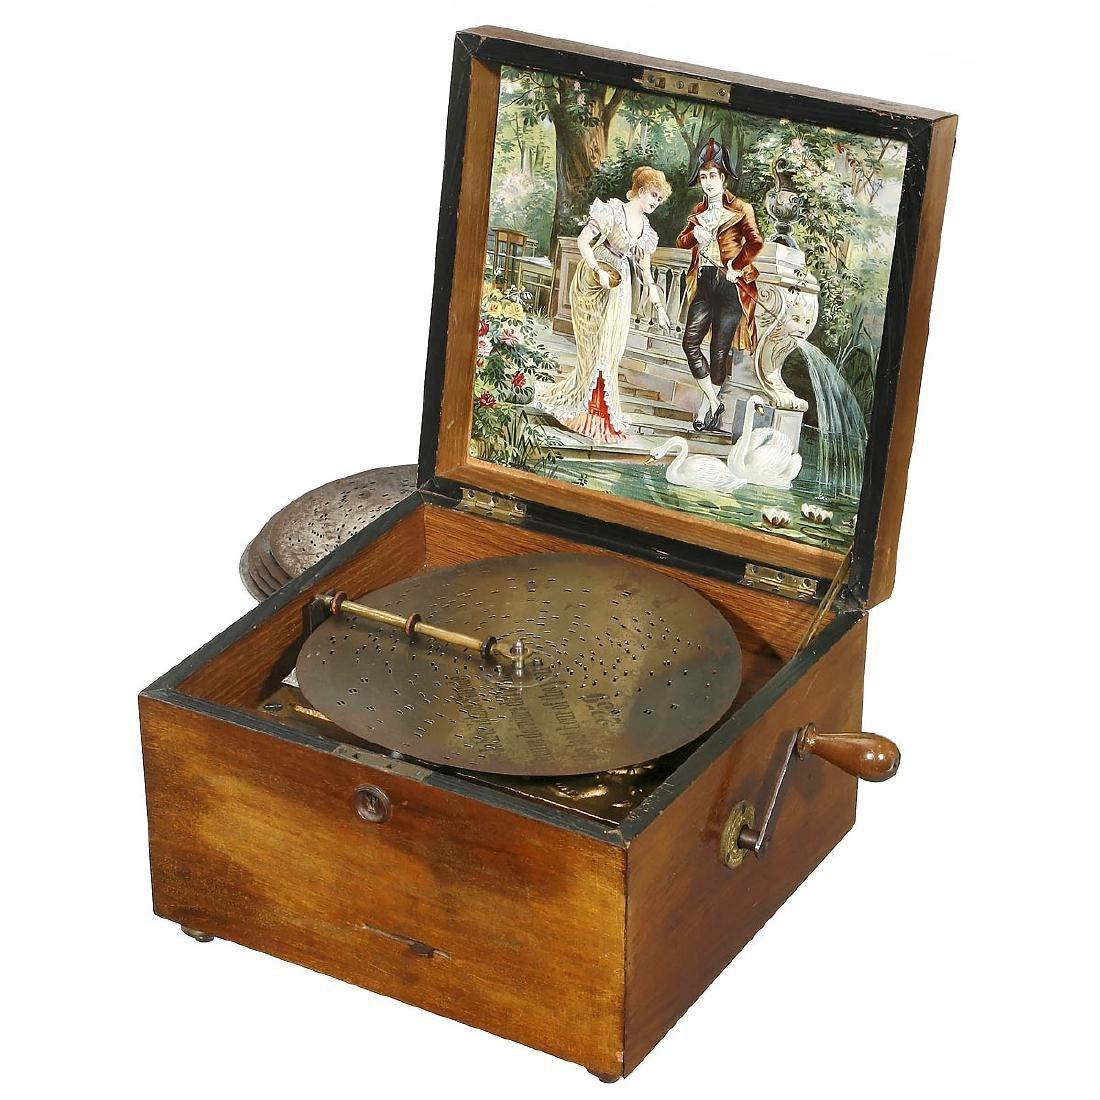 Troubadour Disc Musical Box, c. 1900